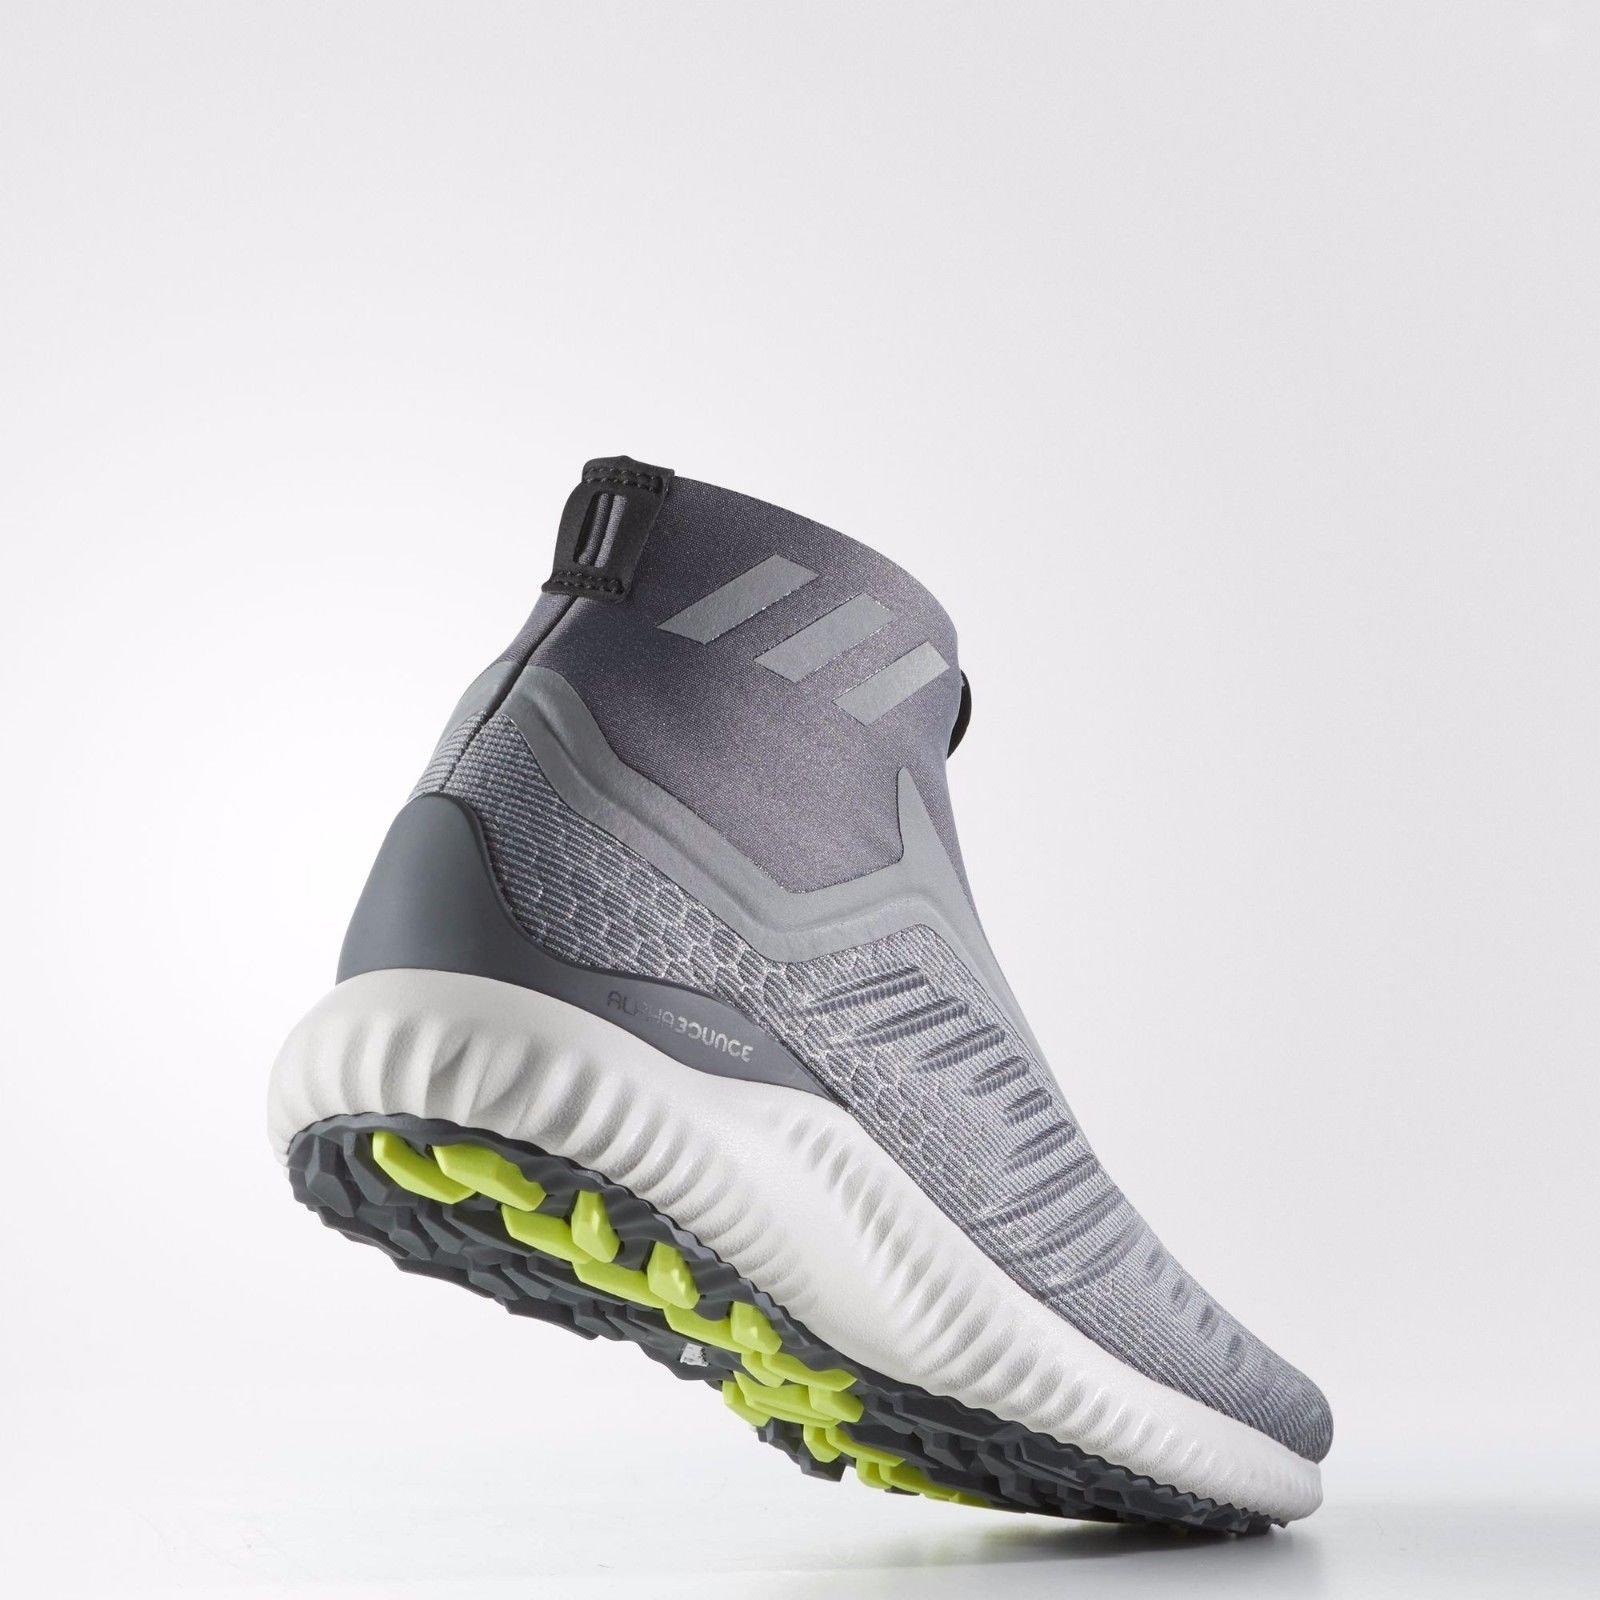 promo code 864e2 142b0 Details about Adidas Men sport performance running alphabounce ZIP Mens  Running Shoes BW1385